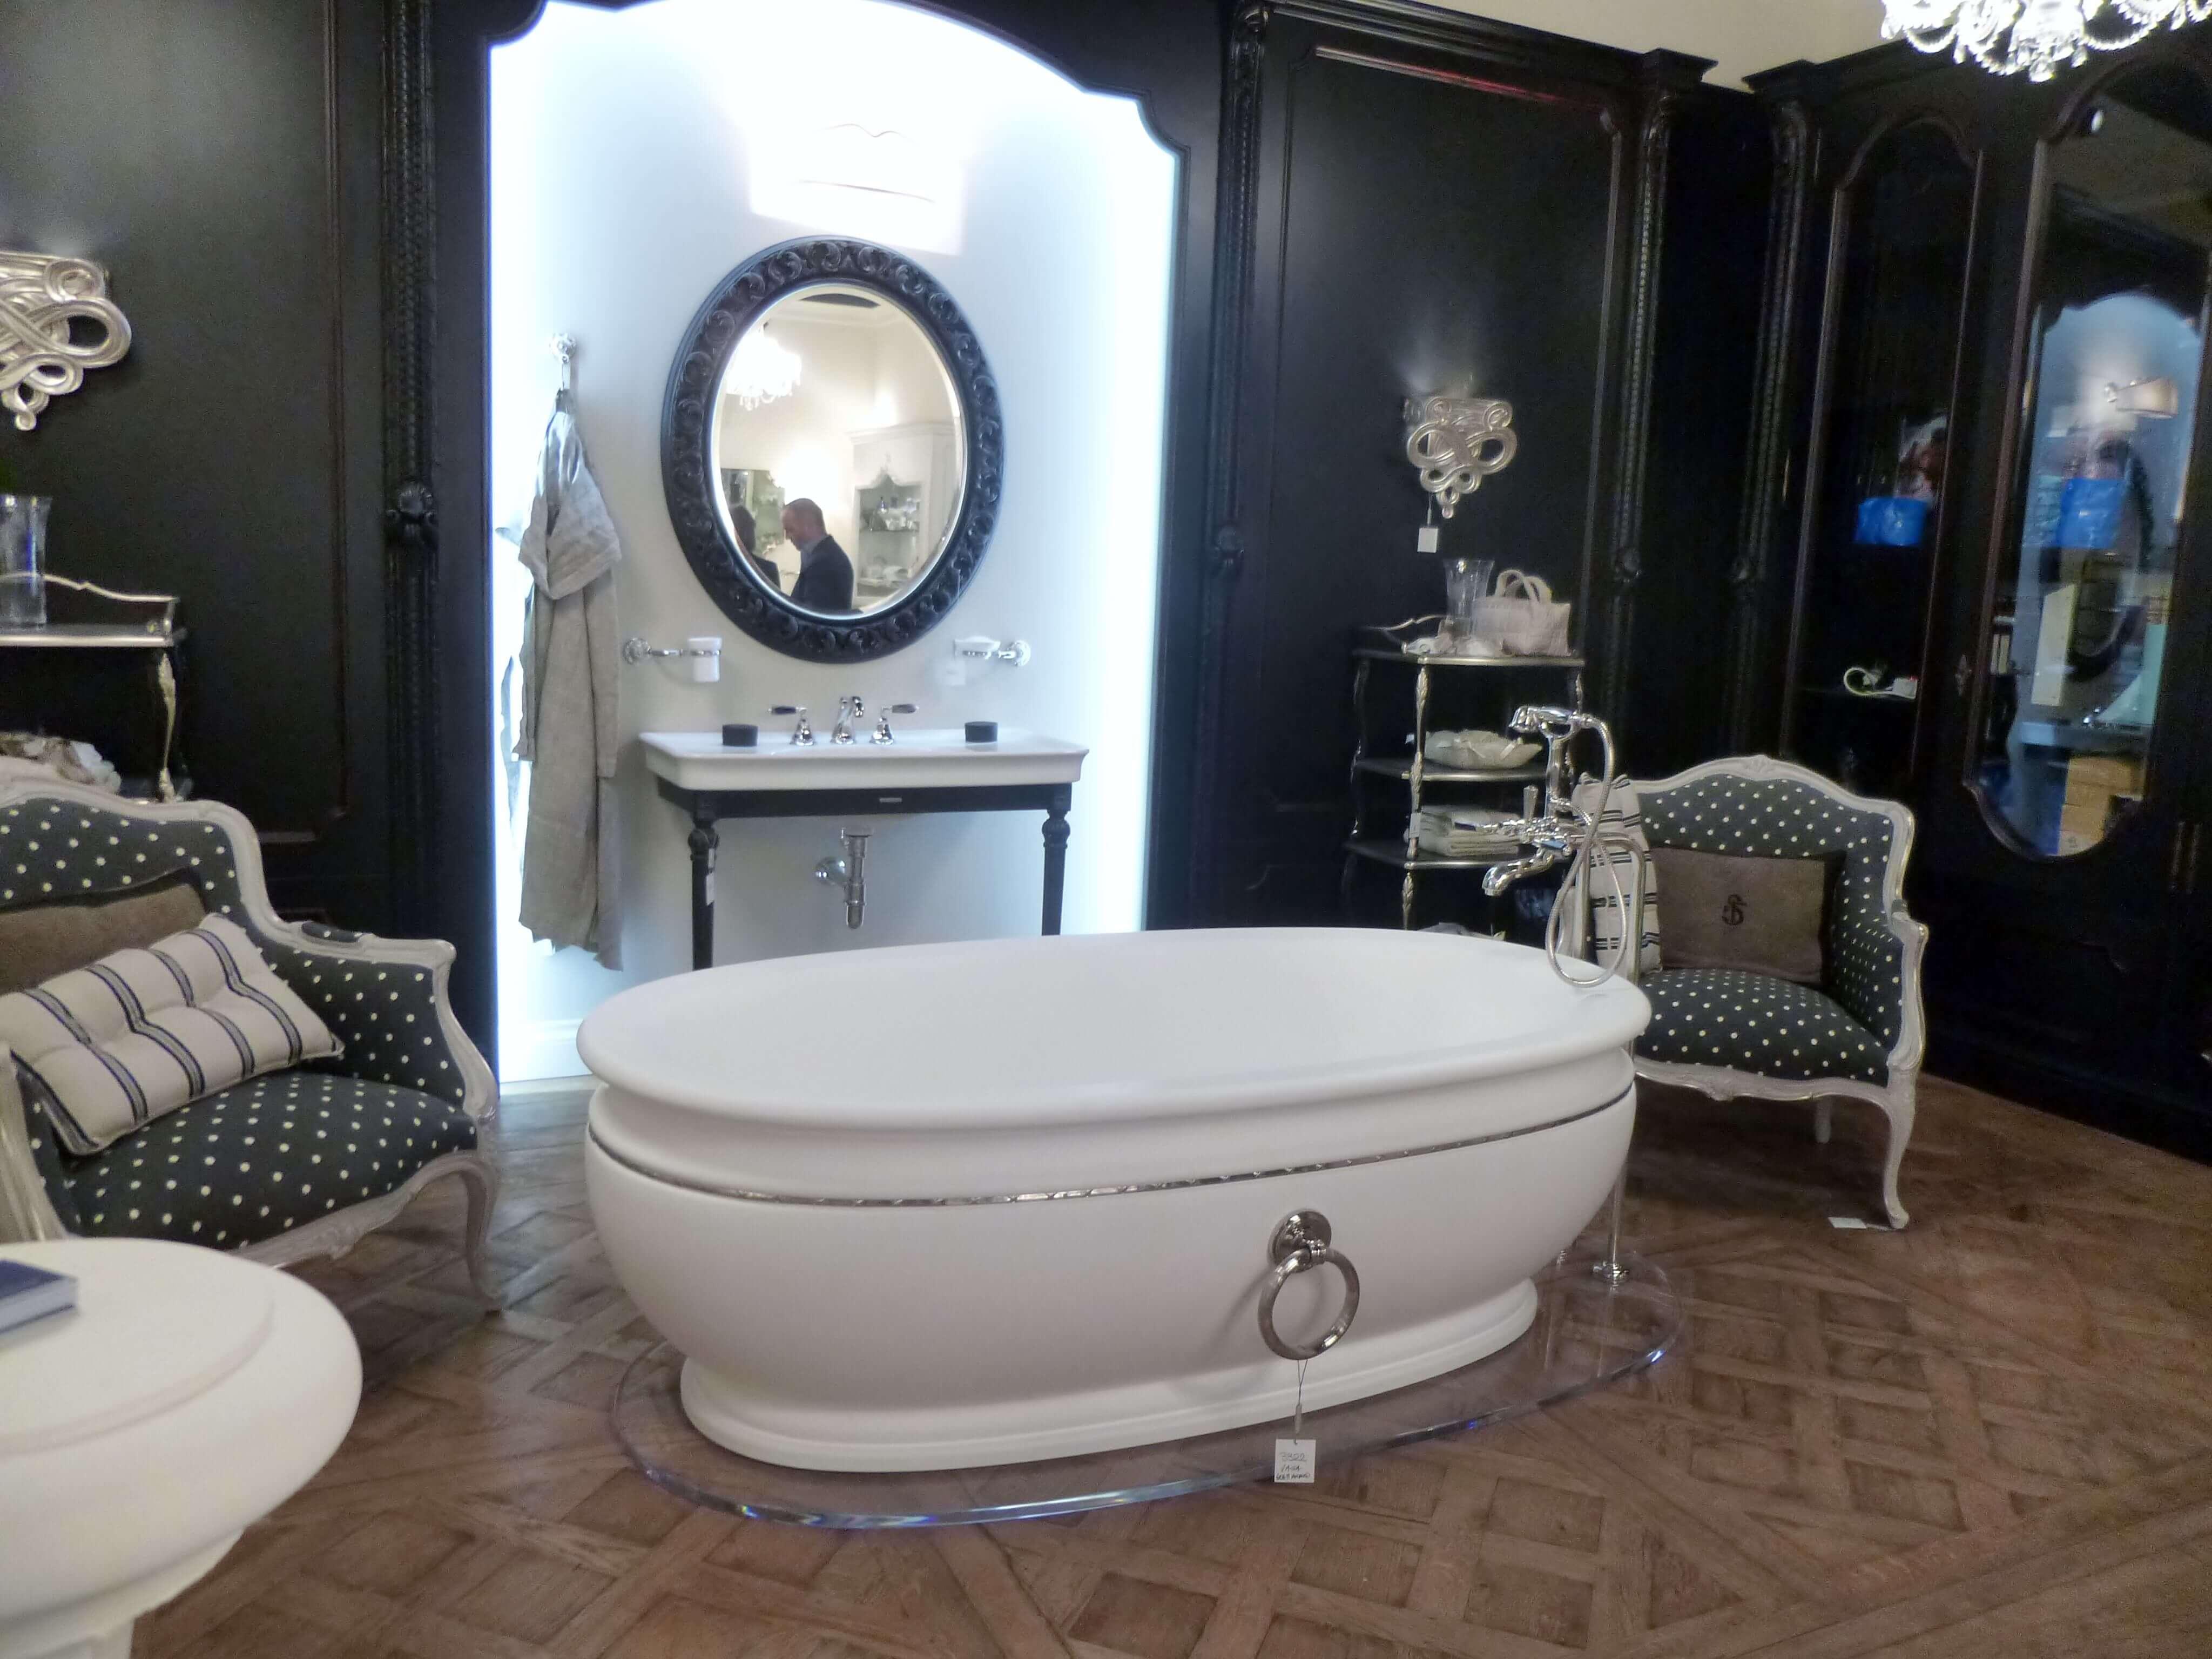 Salone del bagno die gr te badezimmermesse der welt - Fiera del bagno ...